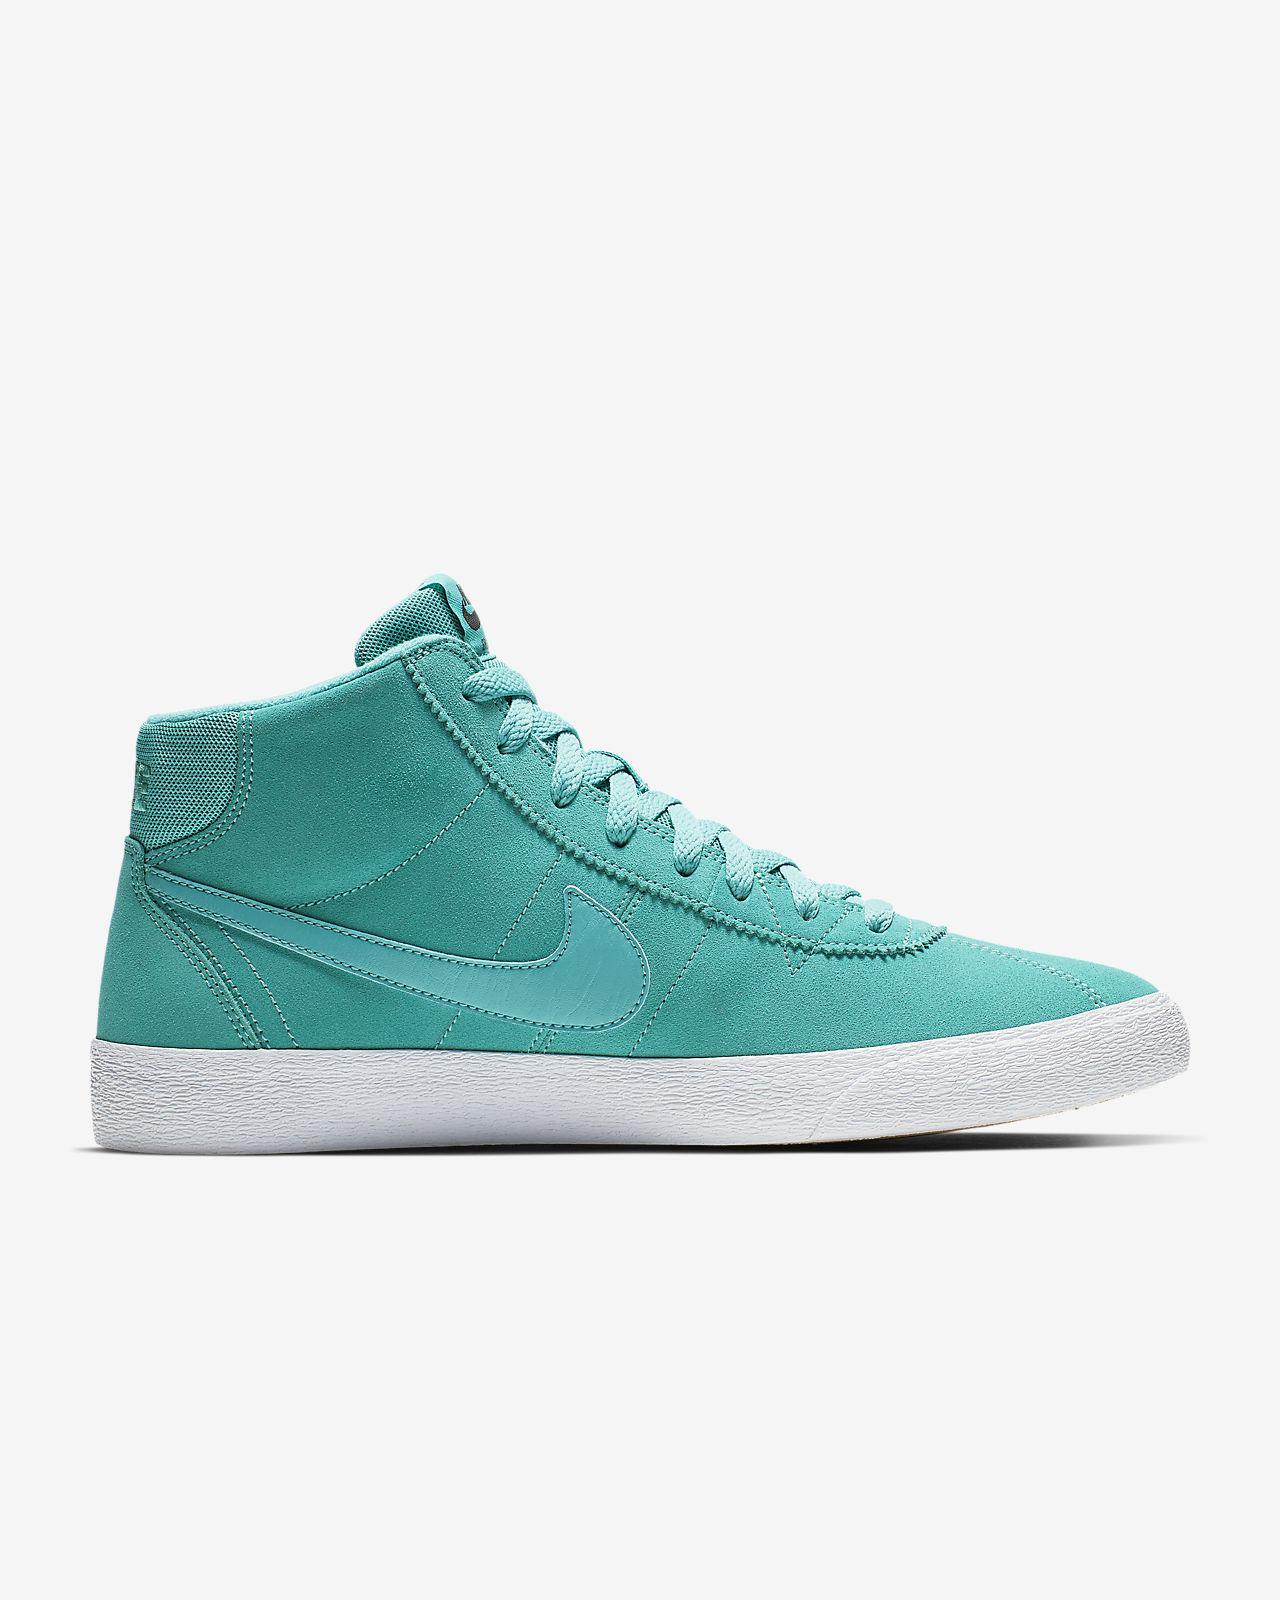 af4f61cfcb3e2 Nike SB Bruin High Women's Skateboarding Shoe. Nike.com